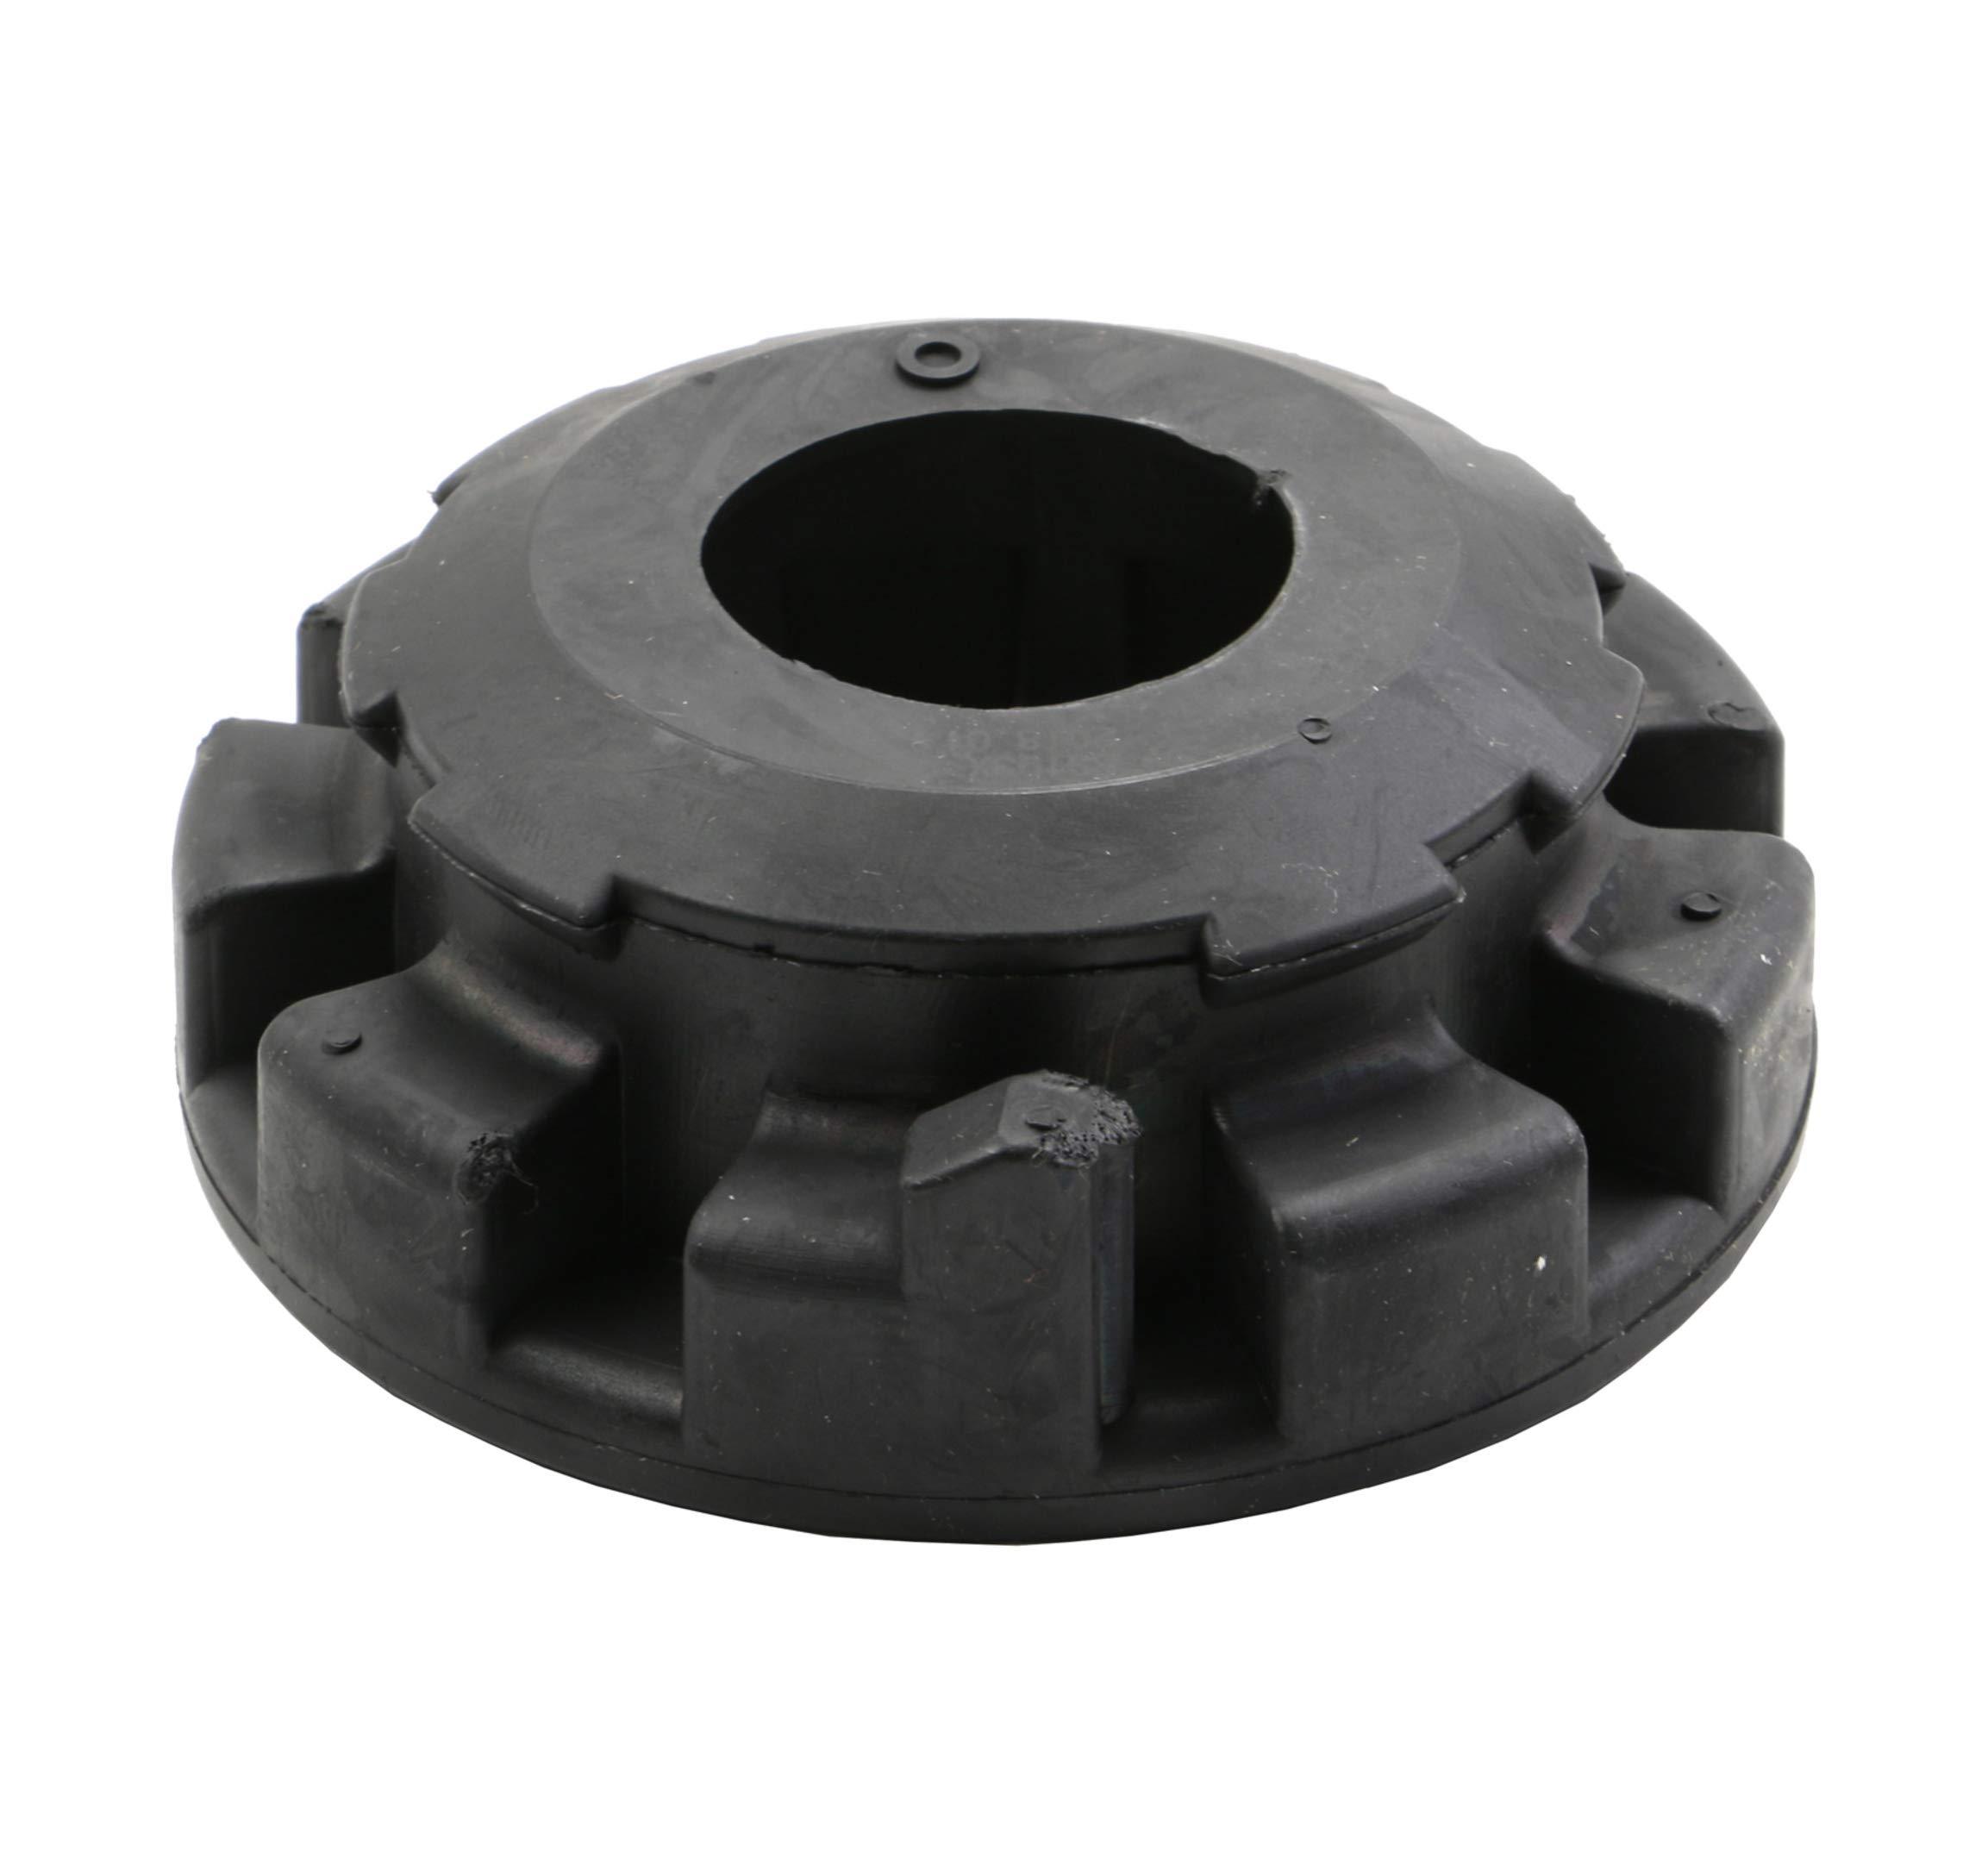 MOOG Steering & Suspension K160041 Coil Spring Insulator